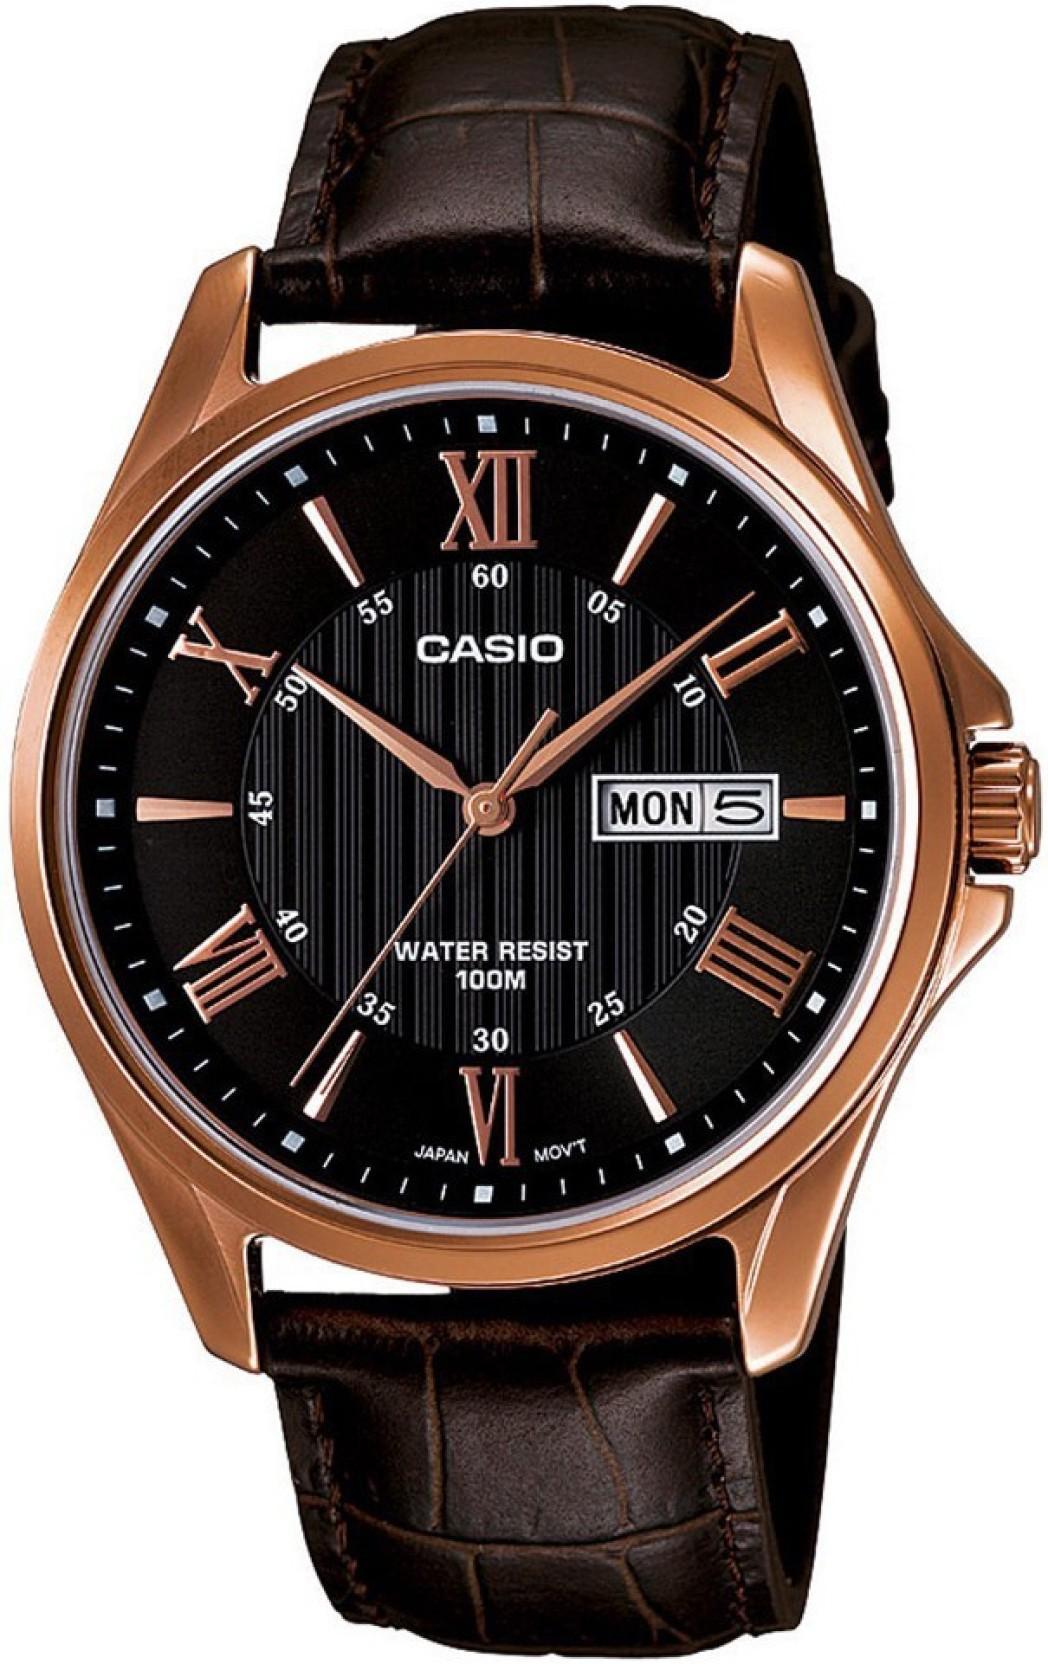 Casio A881 Enticer Men Watch - For Men